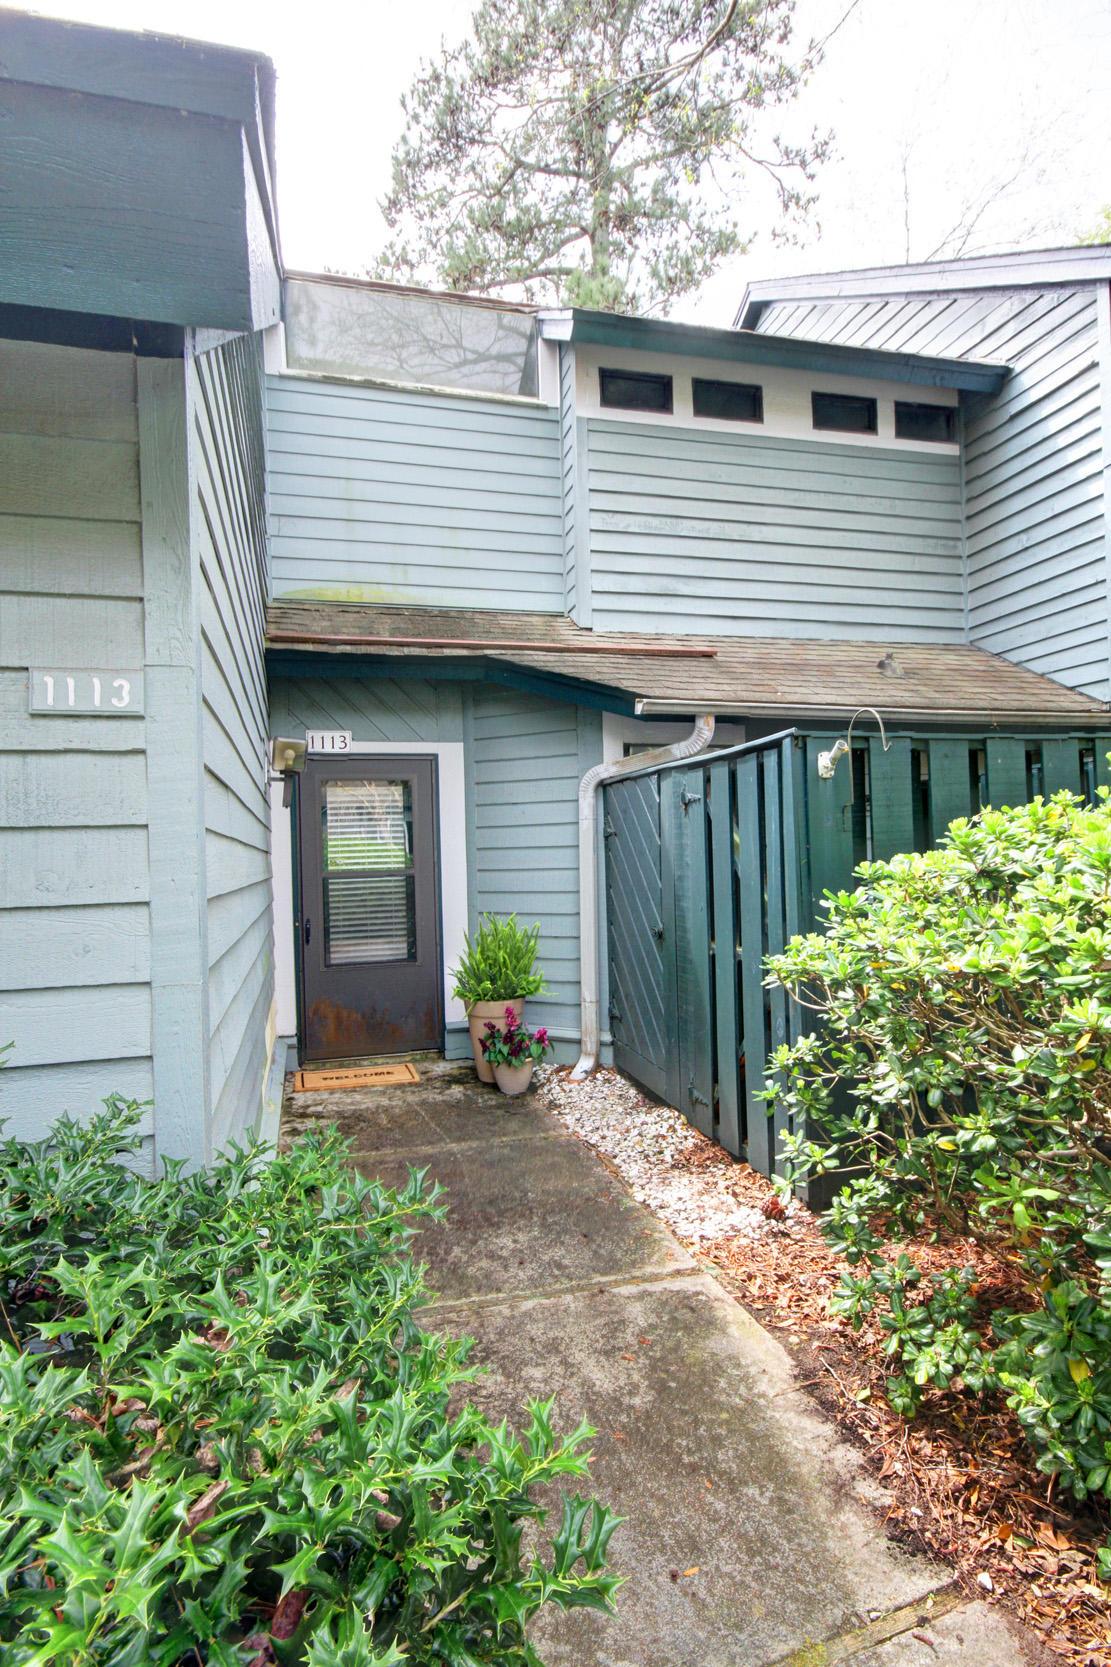 Snee Farm Homes For Sale - 1113 Hidden Cove, Mount Pleasant, SC - 26